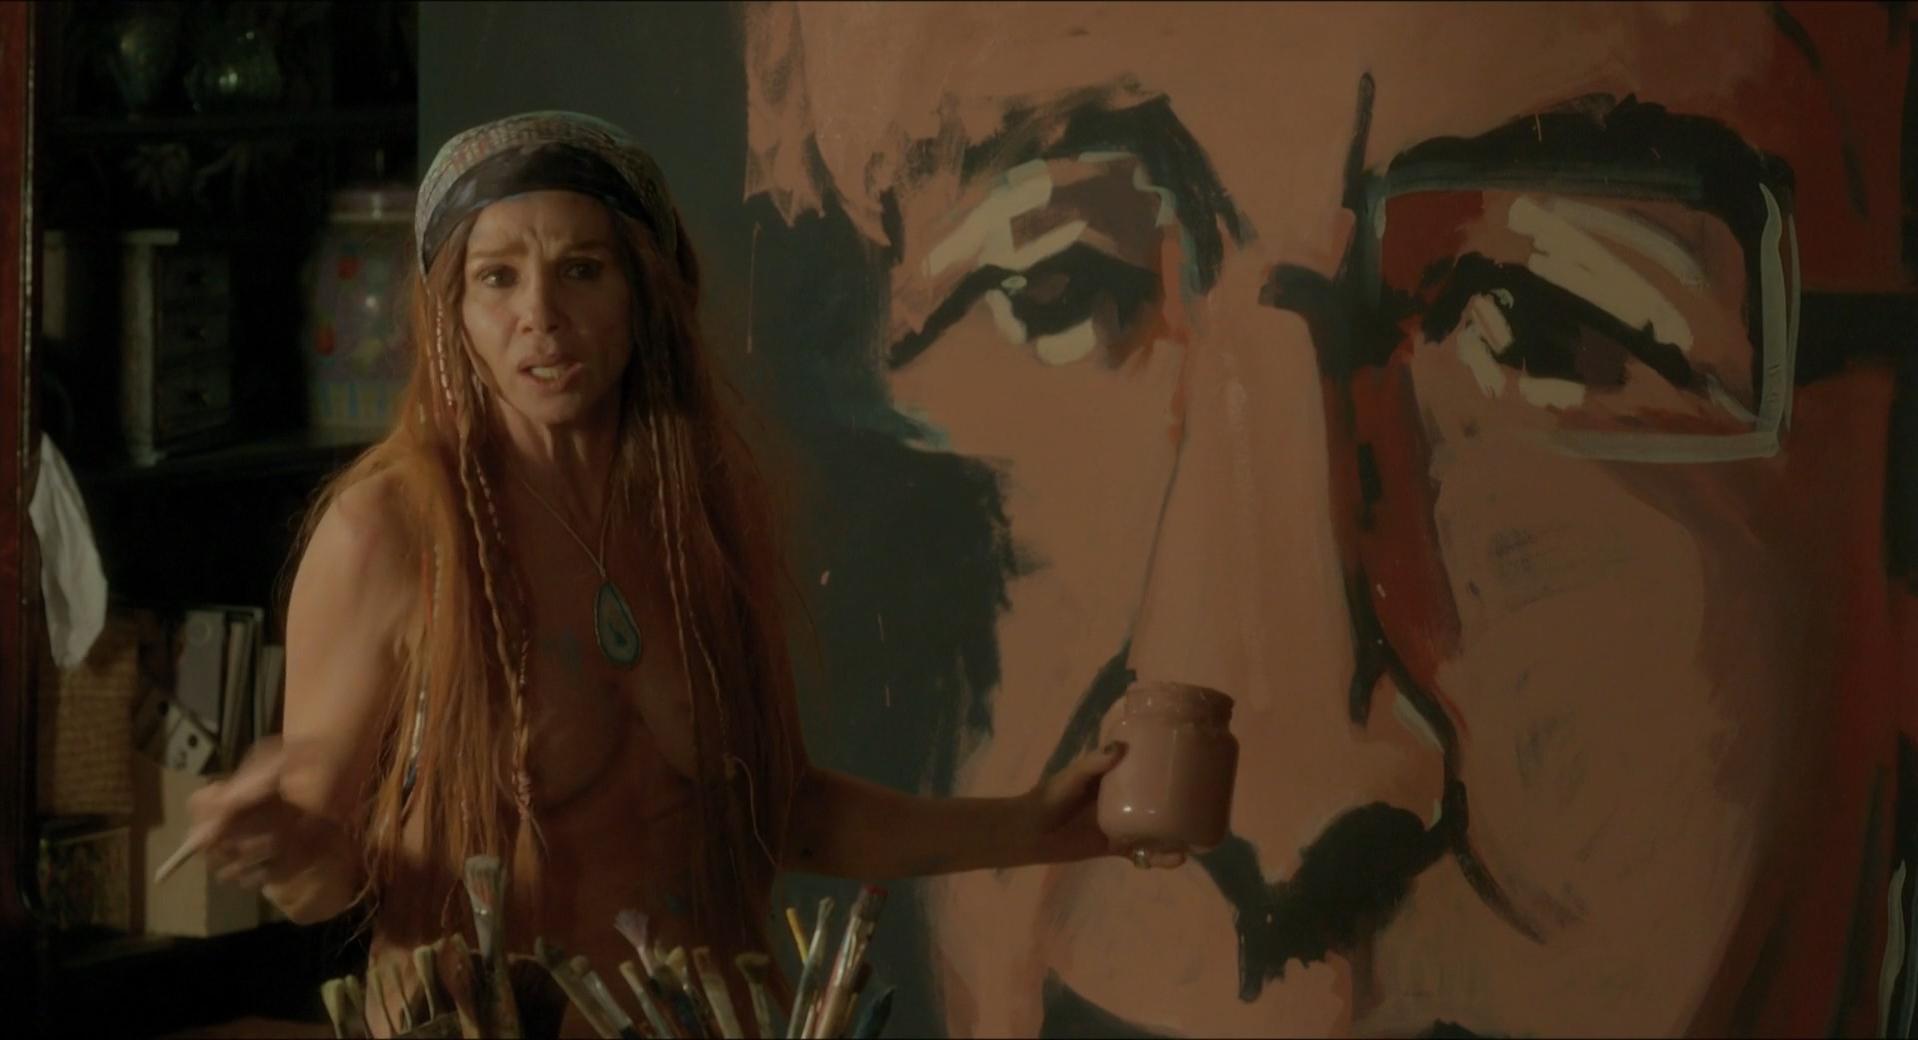 Victoria Abril nude - Josephine s'arrondit (2016)